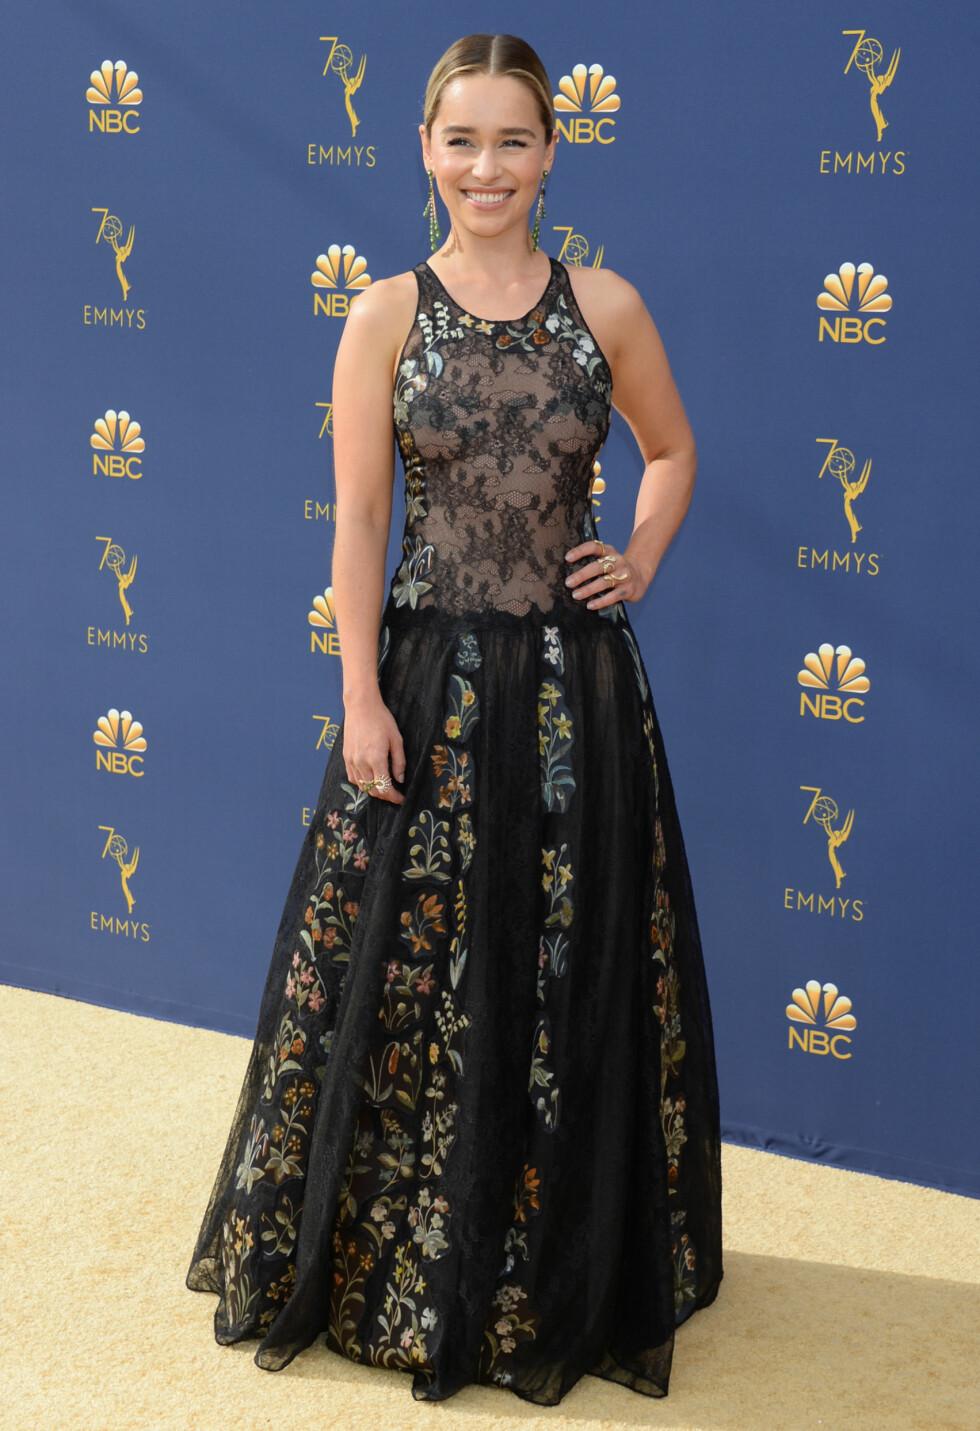 FLOTT: Game of Thrones-skuespiller Emilia Clarke. FOTO: NTB Scanpix